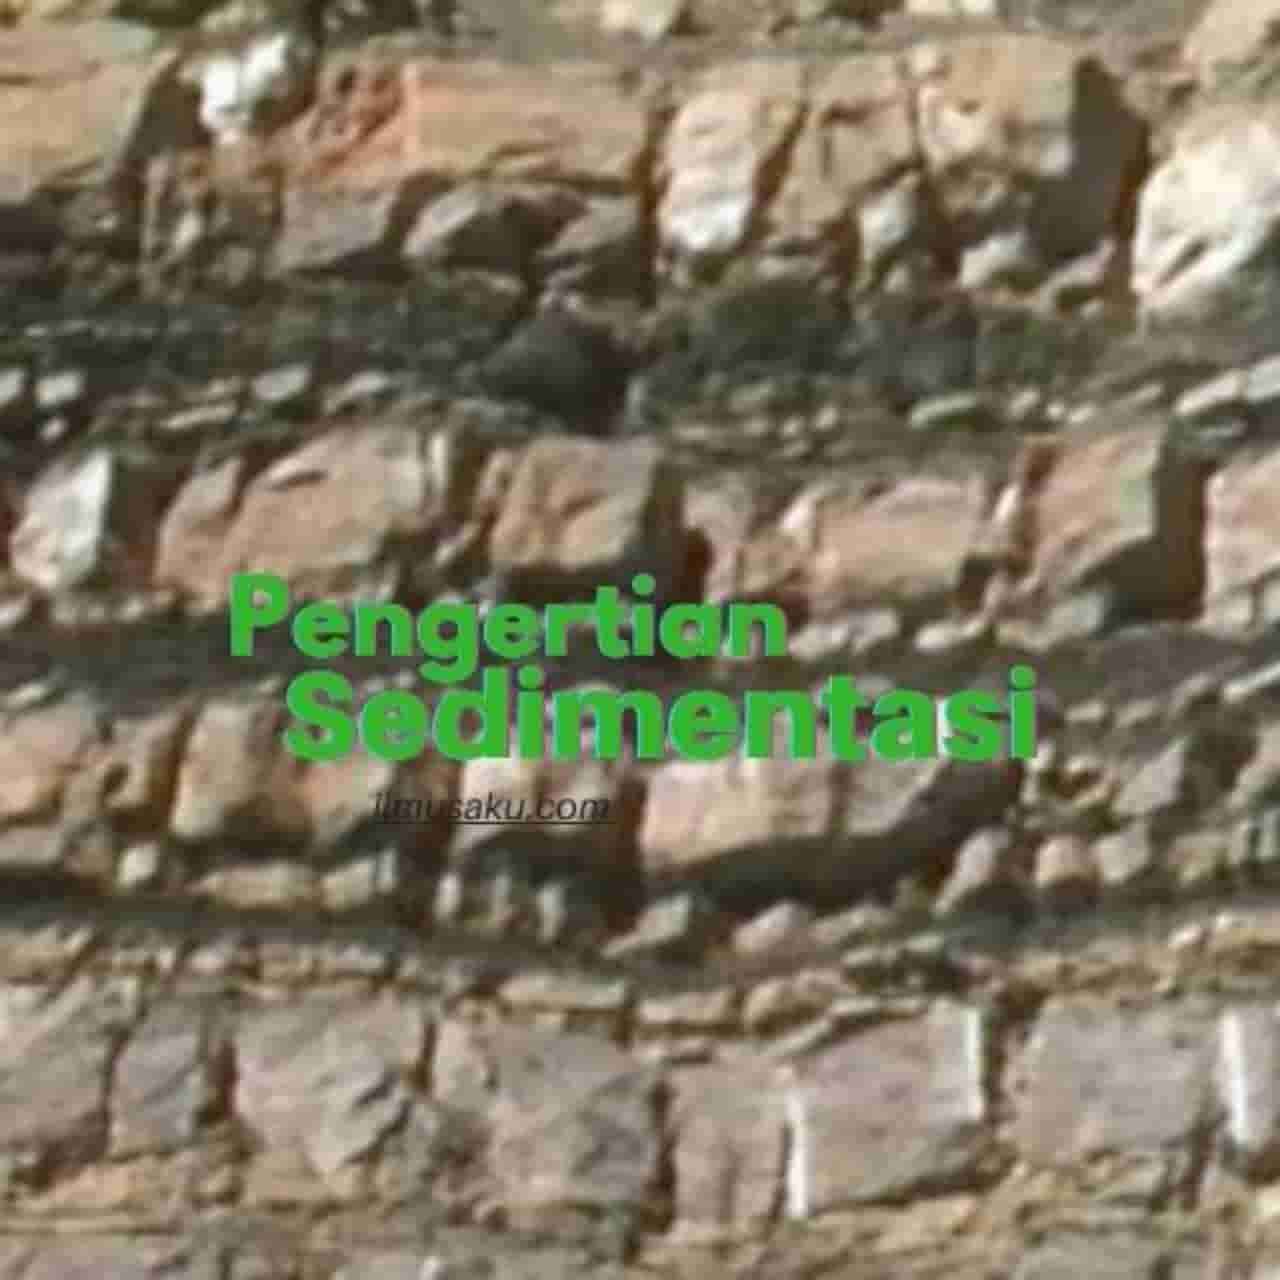 Pengertian sedimentasi